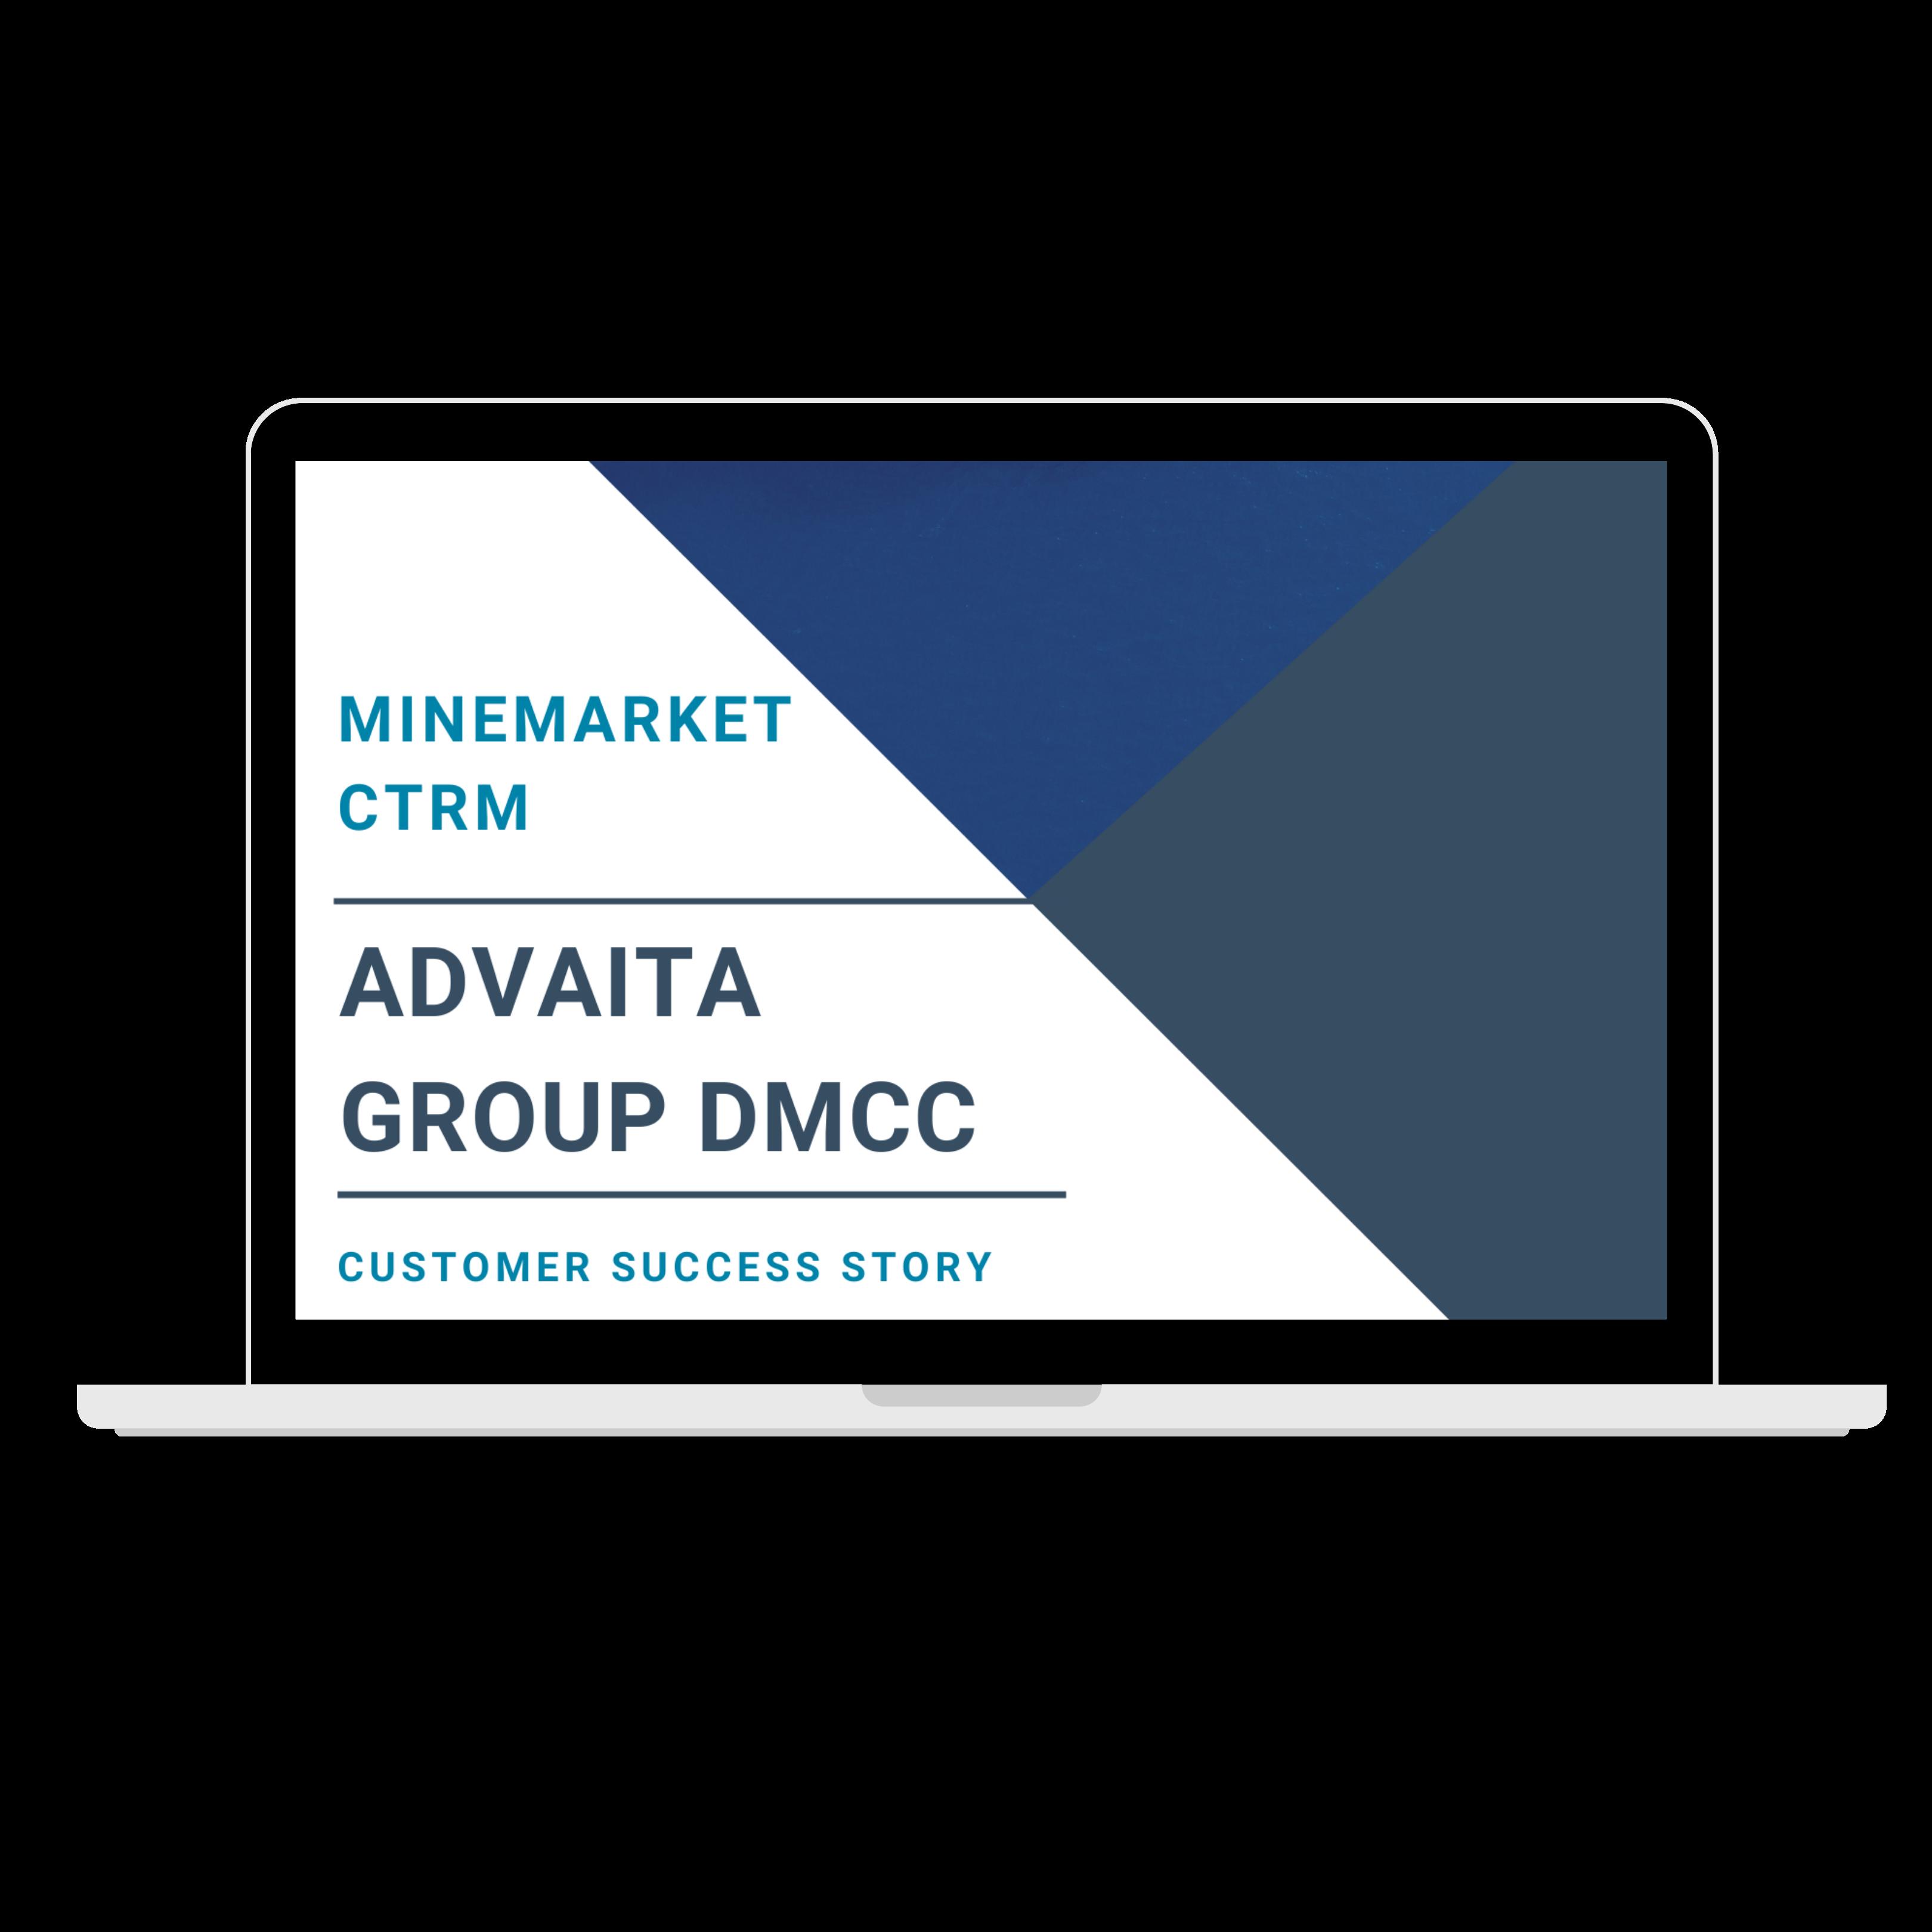 MineMarket CTRM customer success story